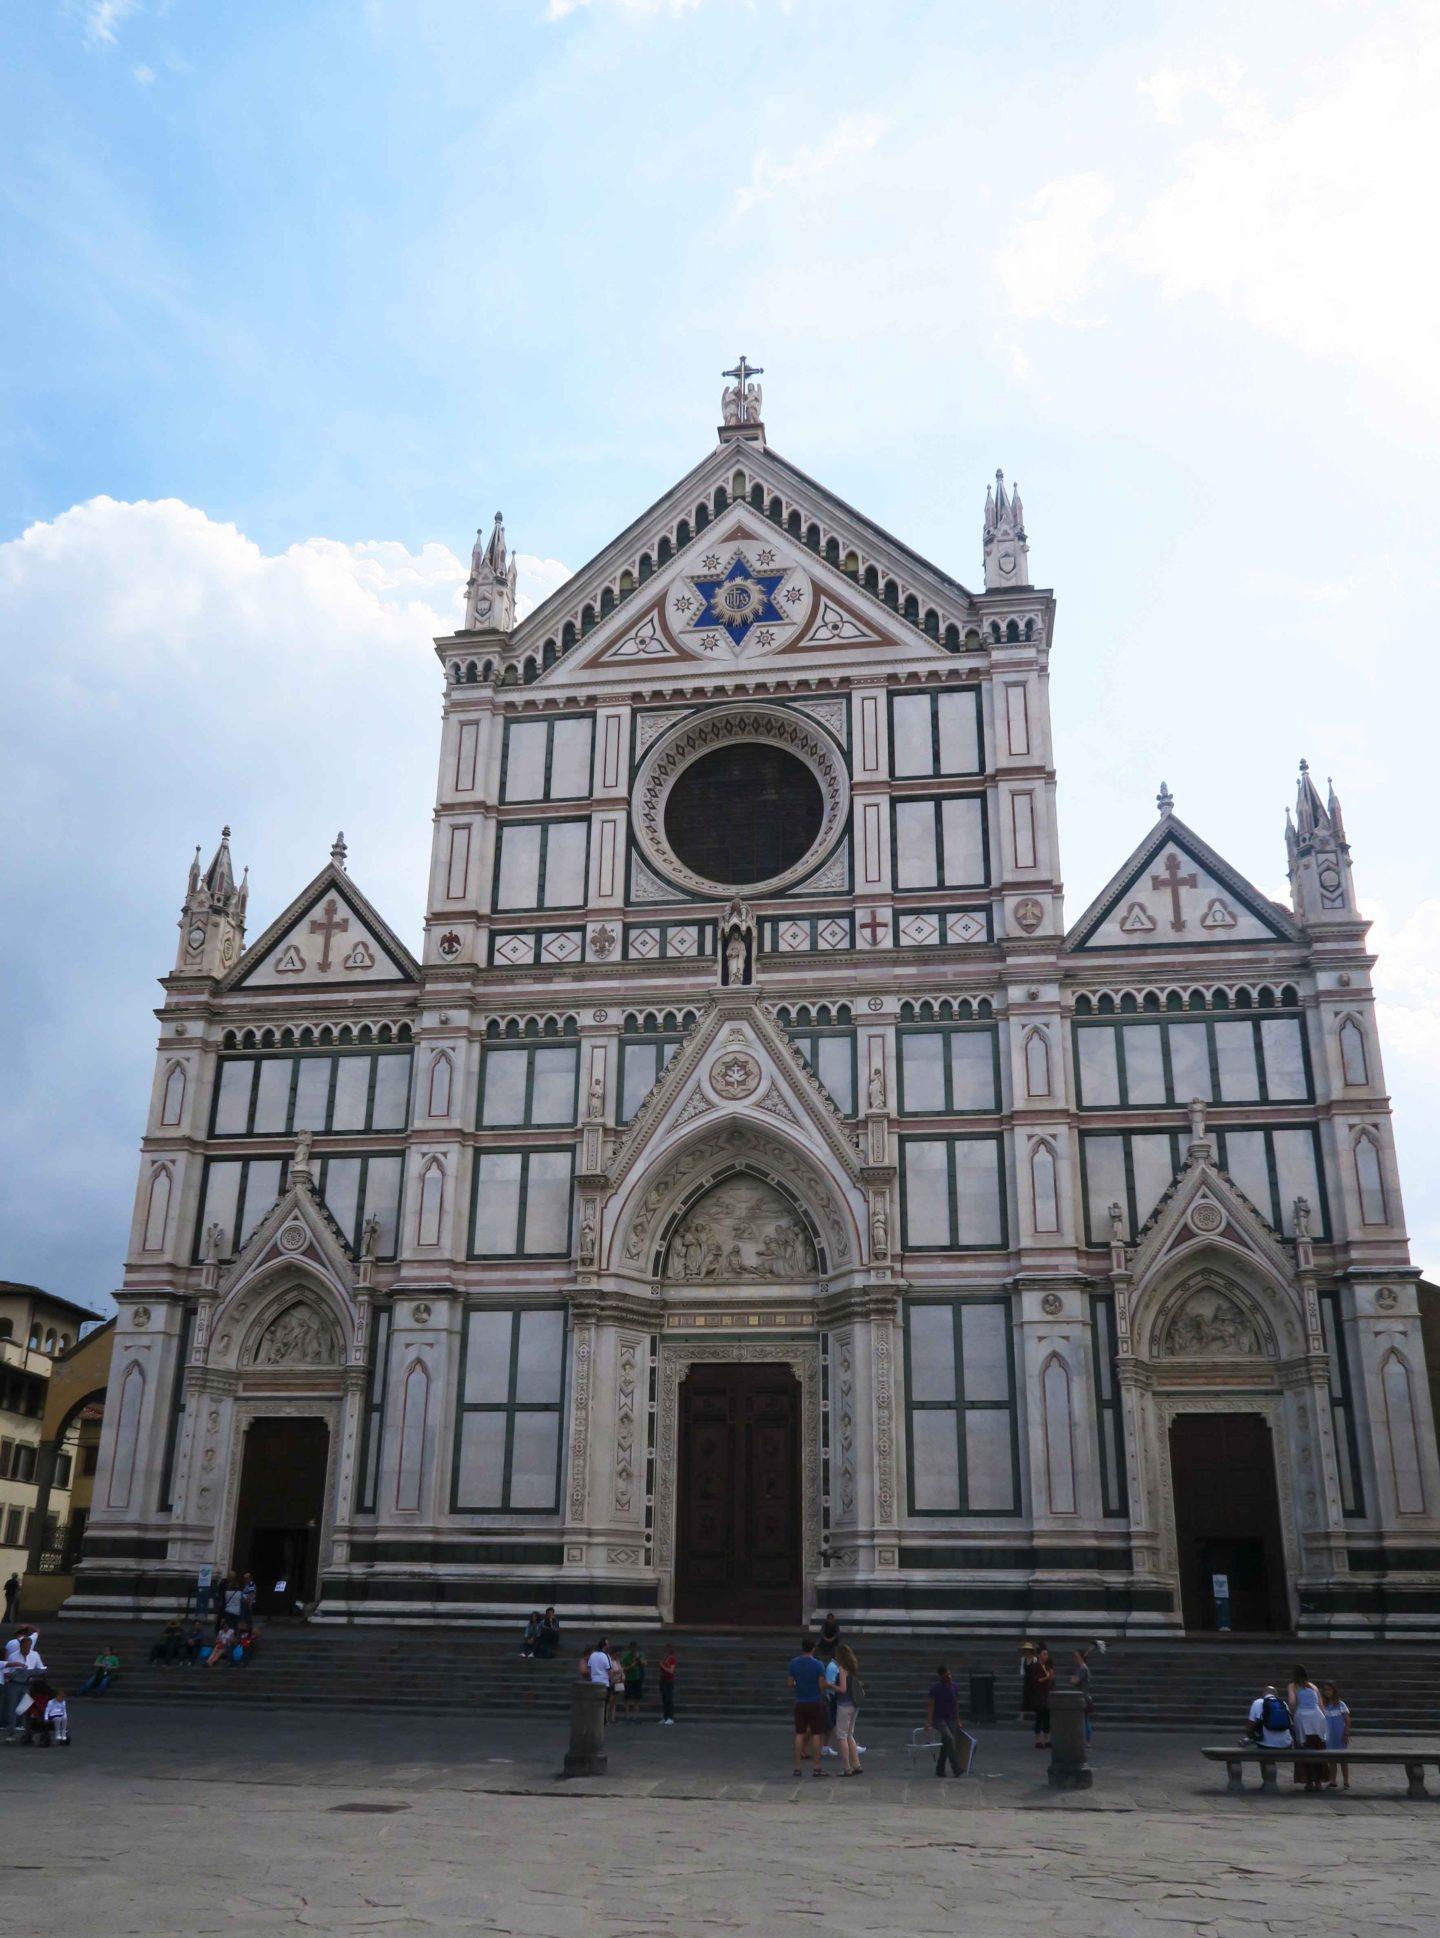 Basilica di San Lorenzo architecture in florence